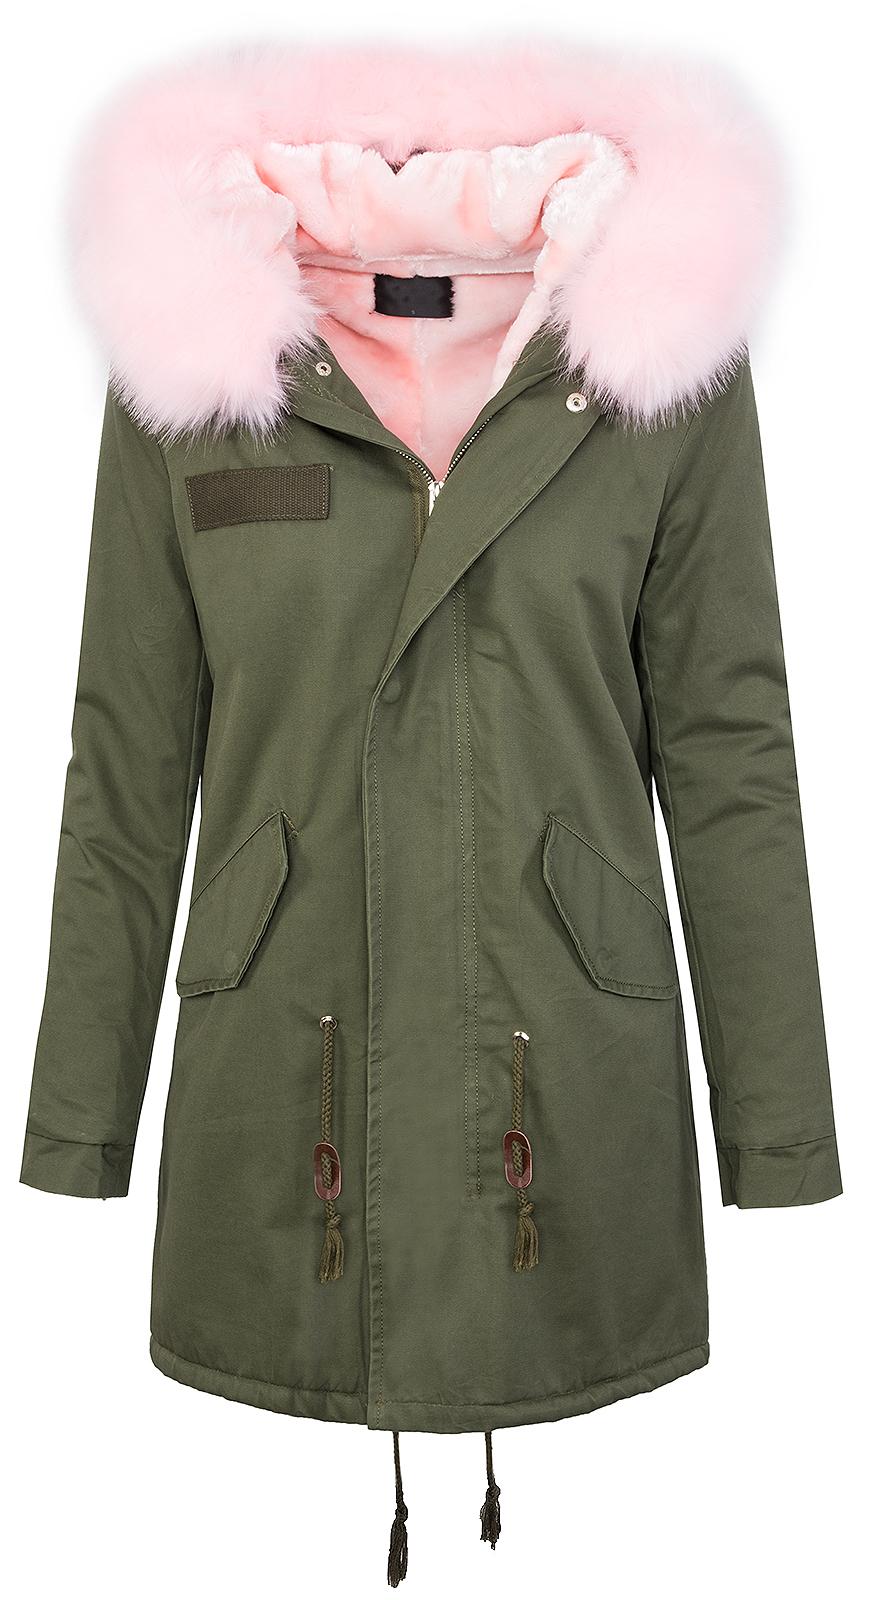 08f8964bb7cd Designer parka damen jacke outdoor jacke wintermantel grün khaki D ...